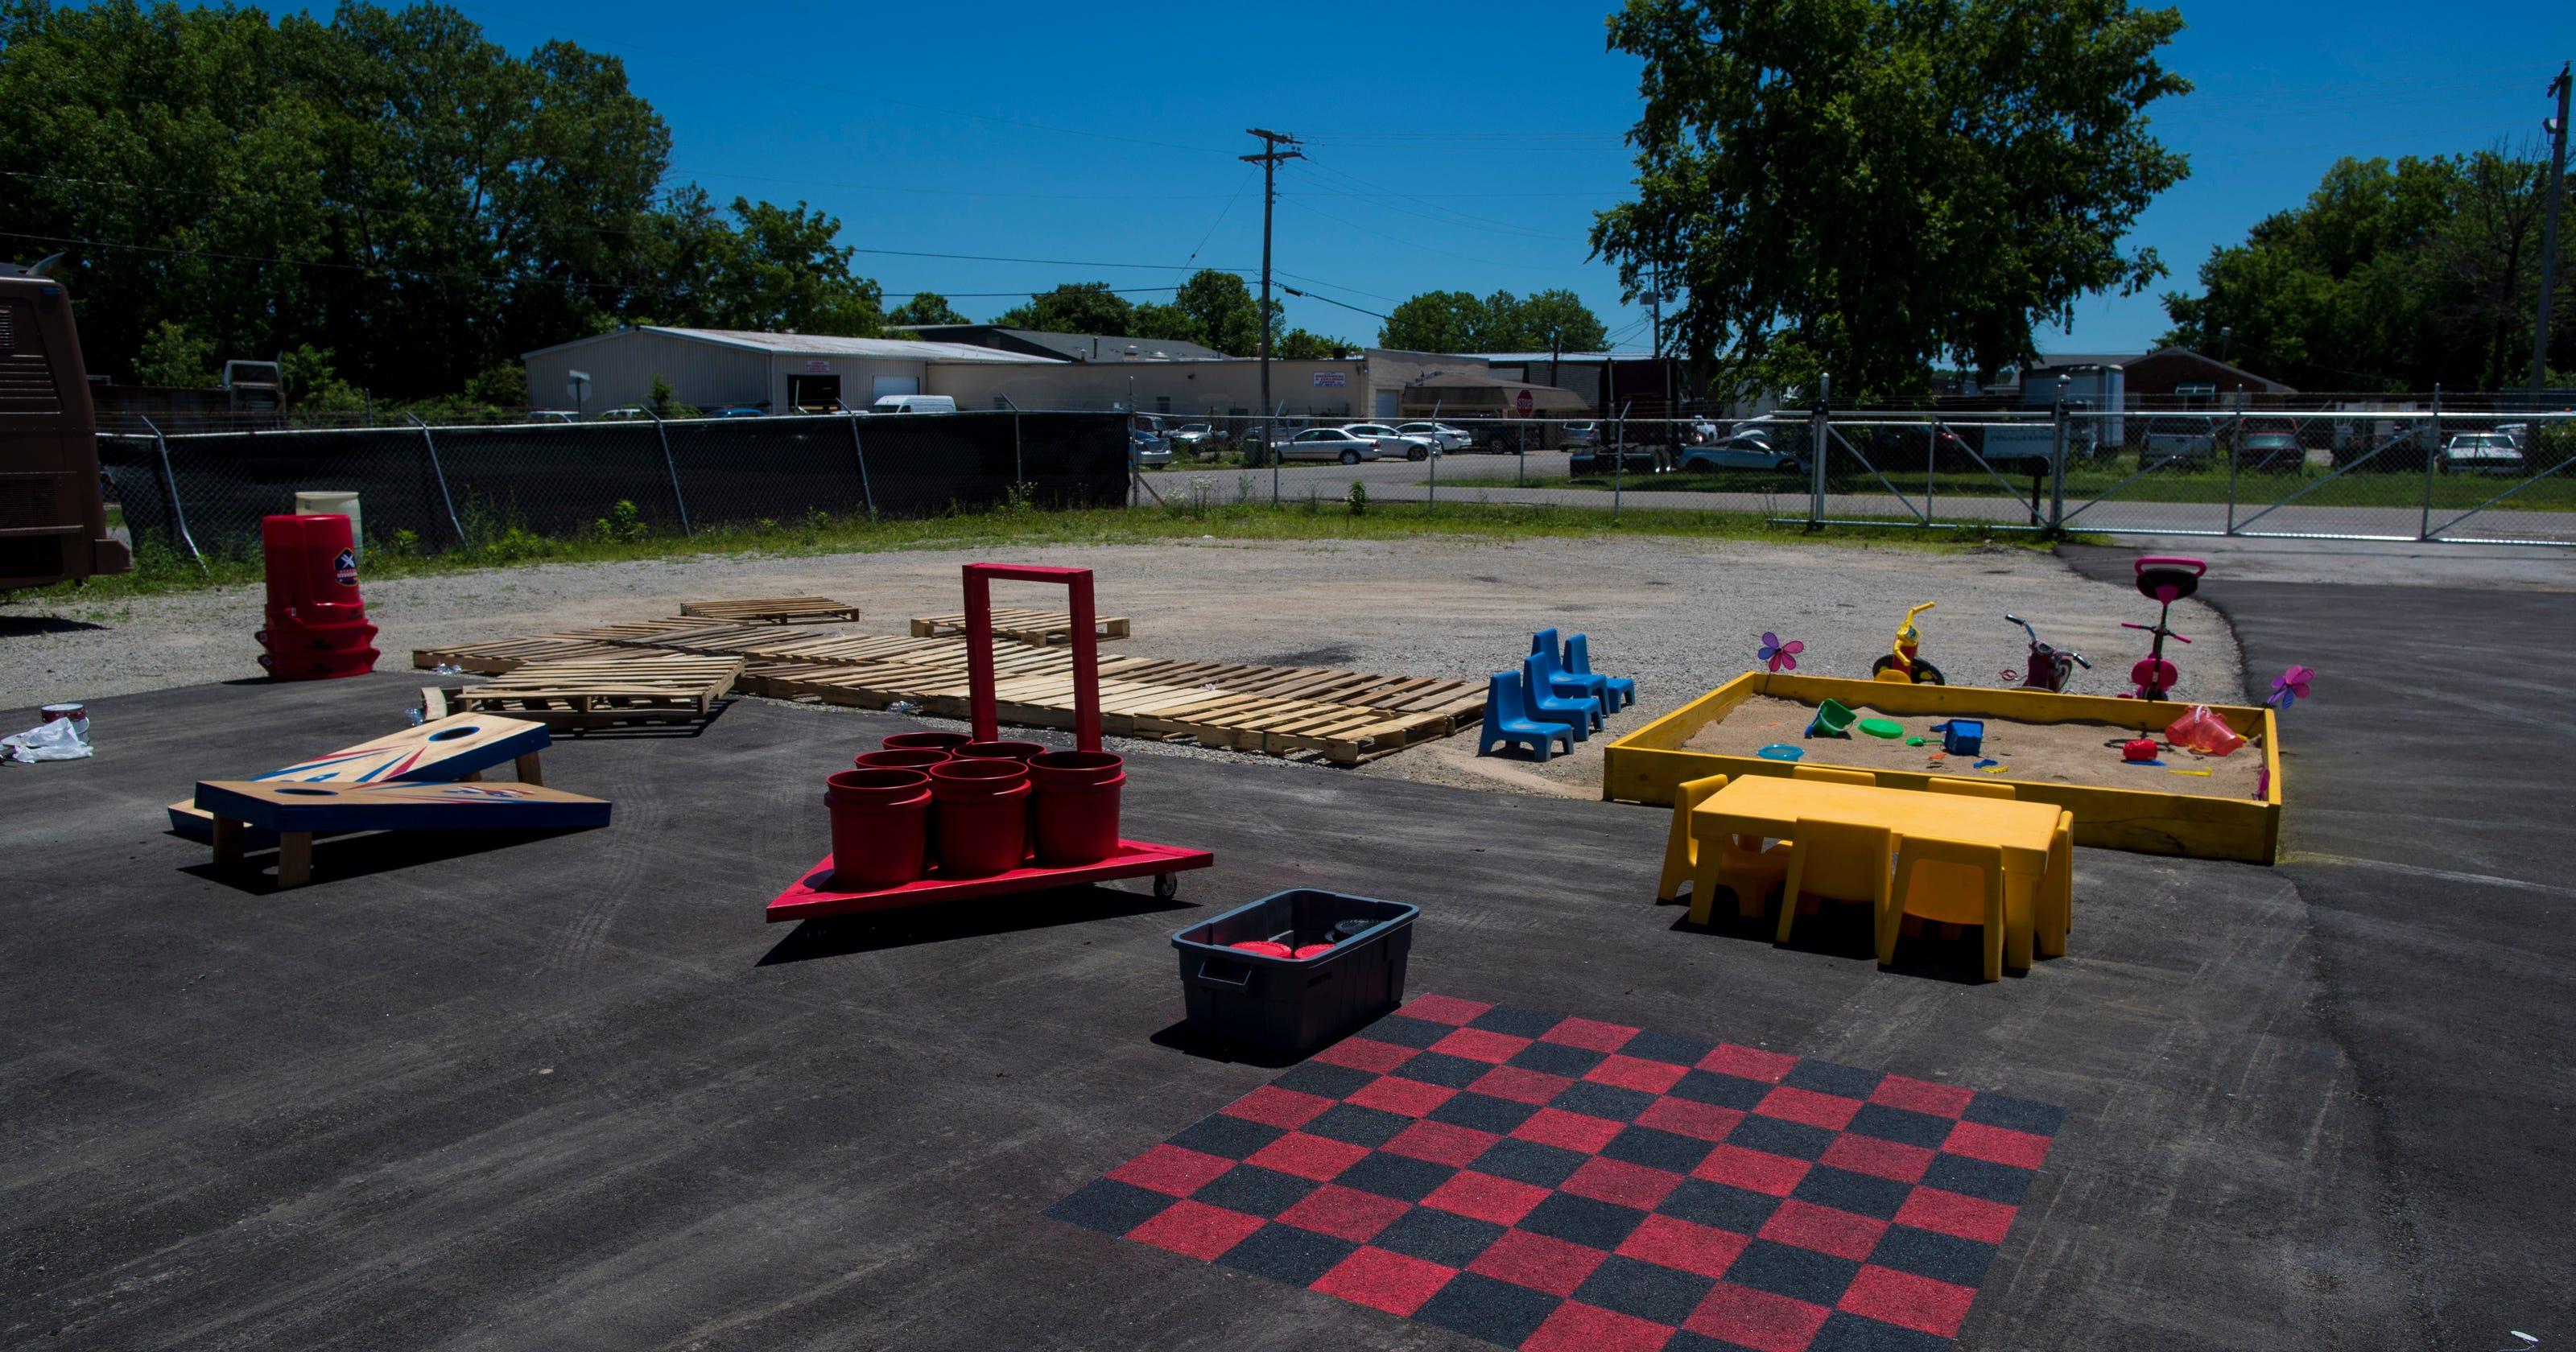 New Louisville food truck park wants to elevate street food